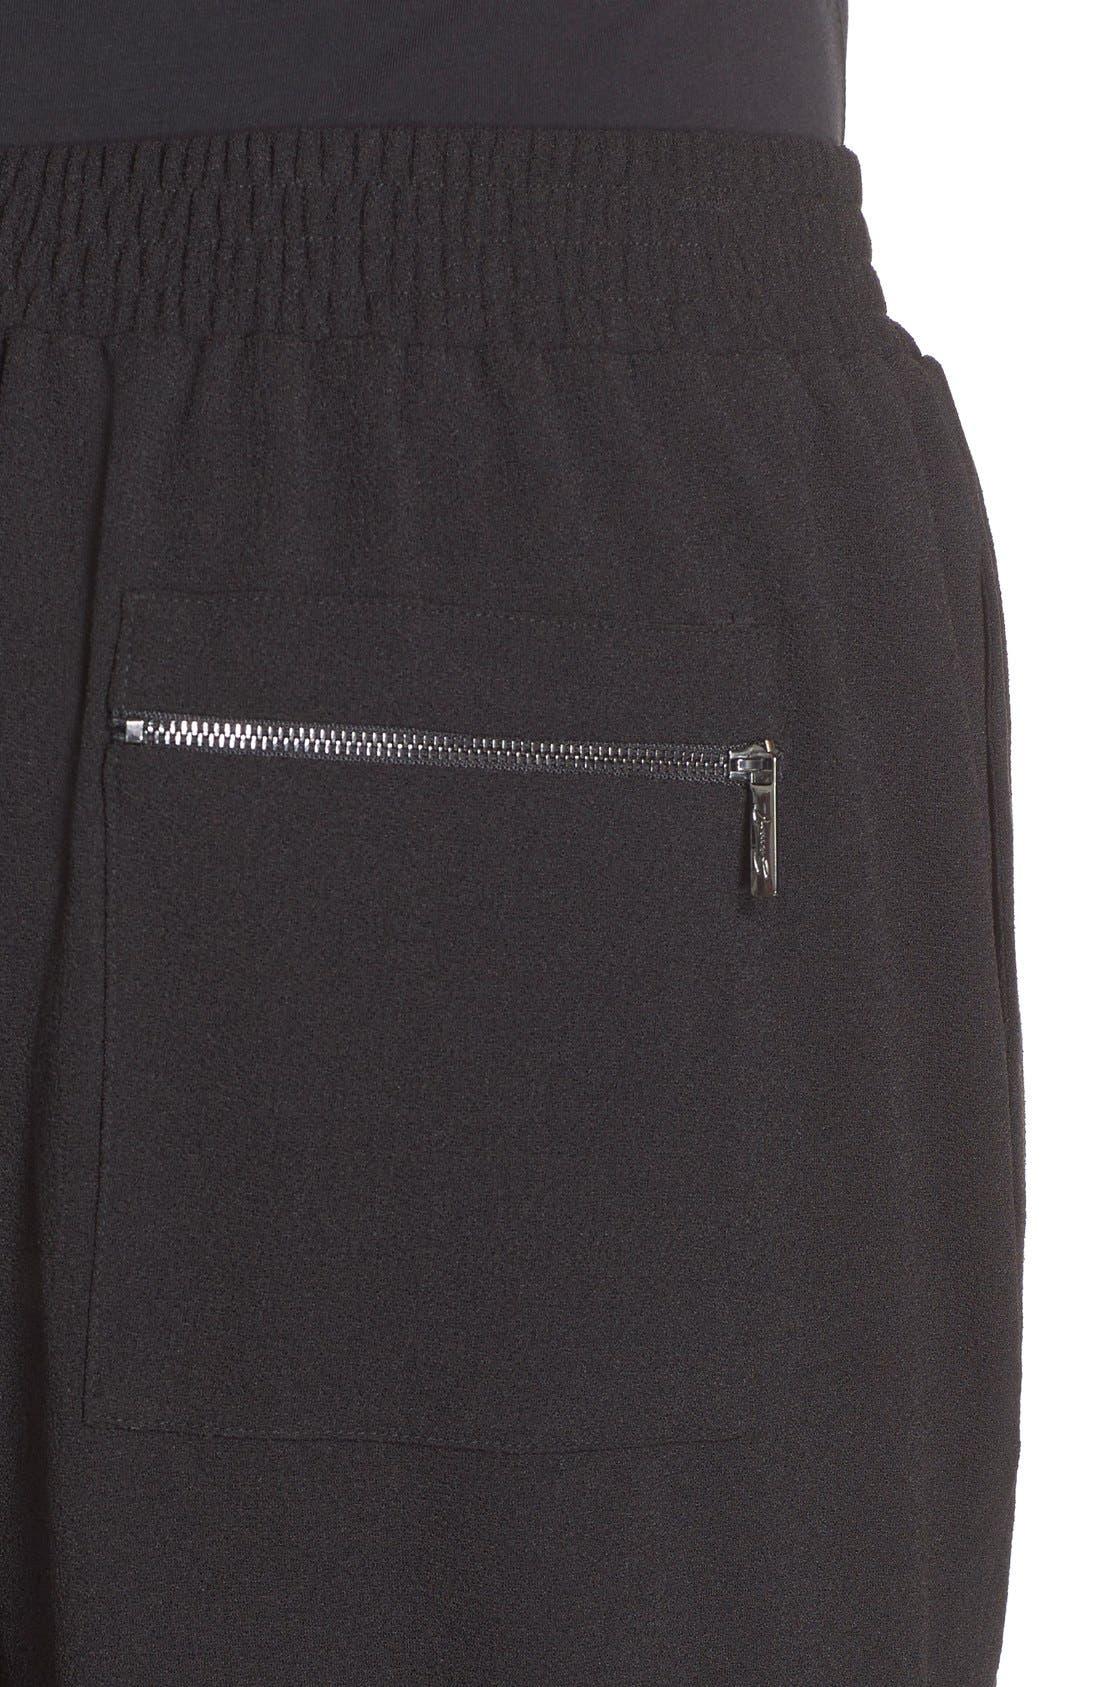 MELISSA MCCARTHY SEVEN7, Zip Pocket Harem Pants, Alternate thumbnail 5, color, 001